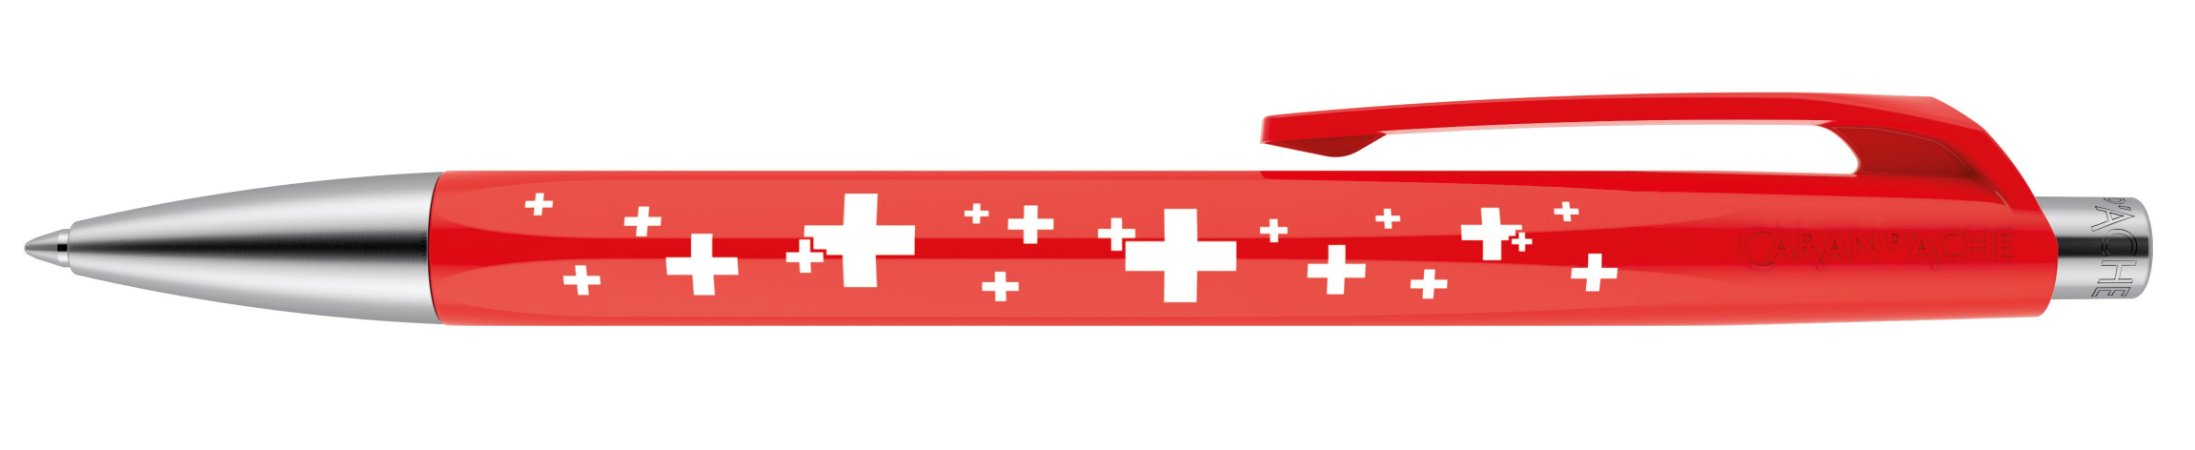 Caneta Caran D'Ache 888 Infinite Swiss Cross